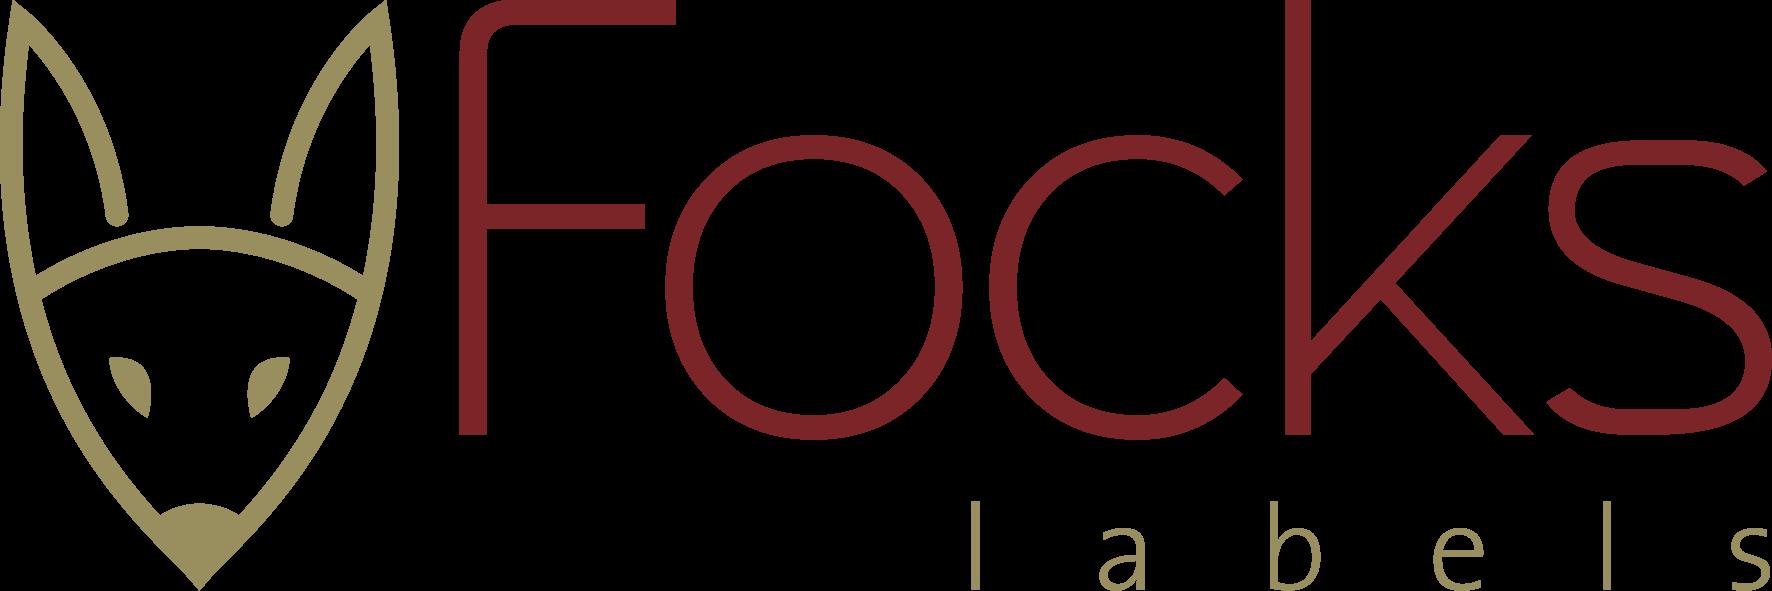 Focks Labels